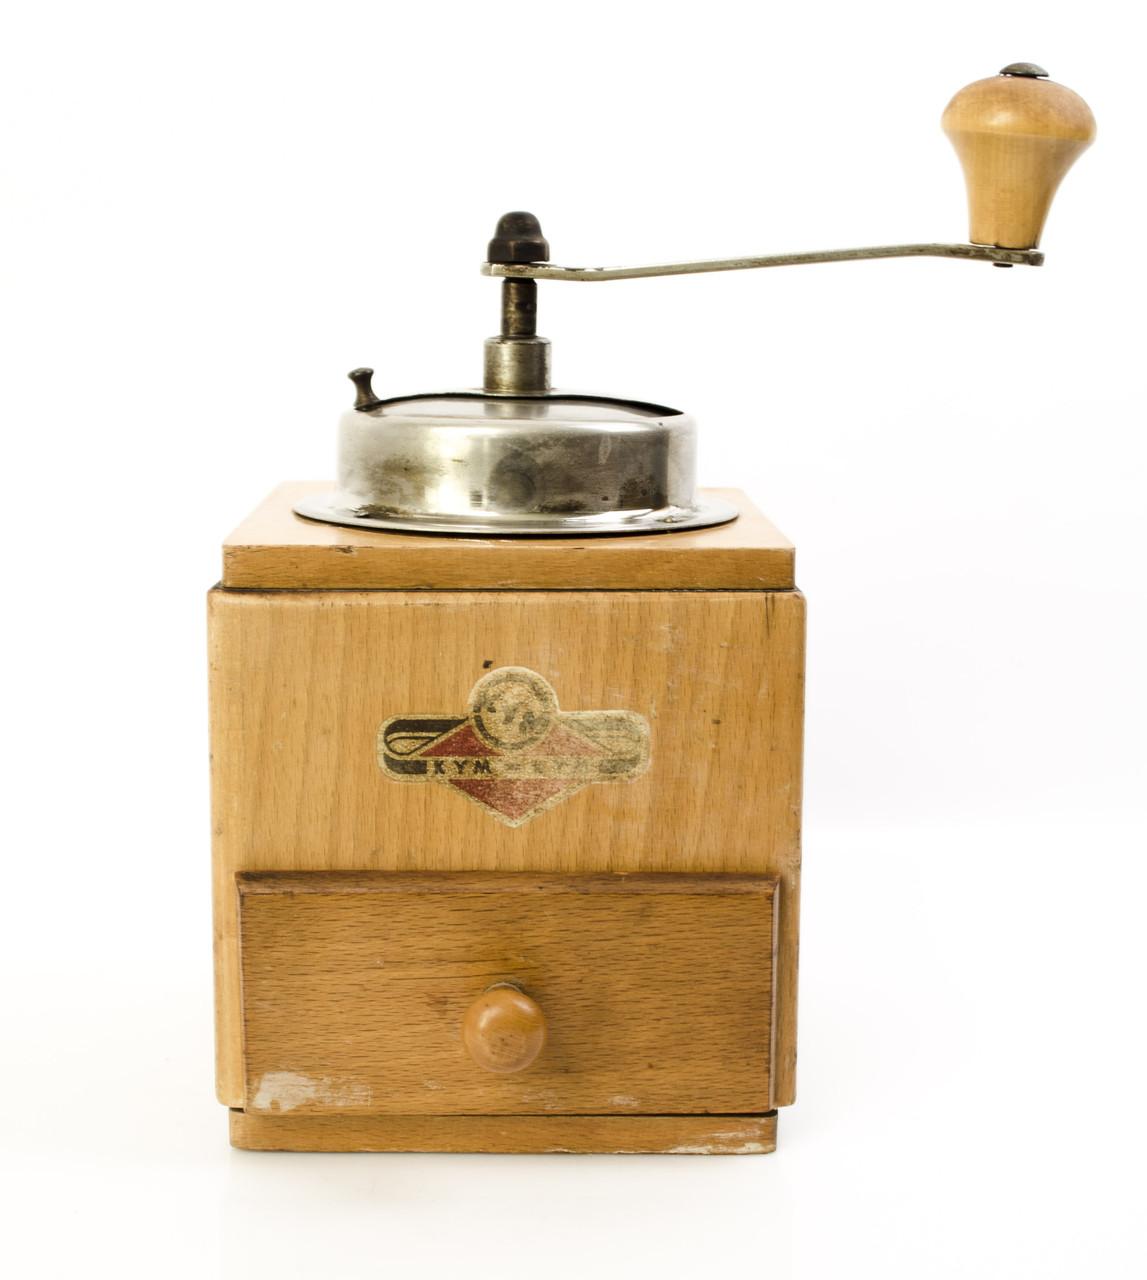 Cтарая кофемолка, Германия, Stahlmalwerk mit Feinsteller